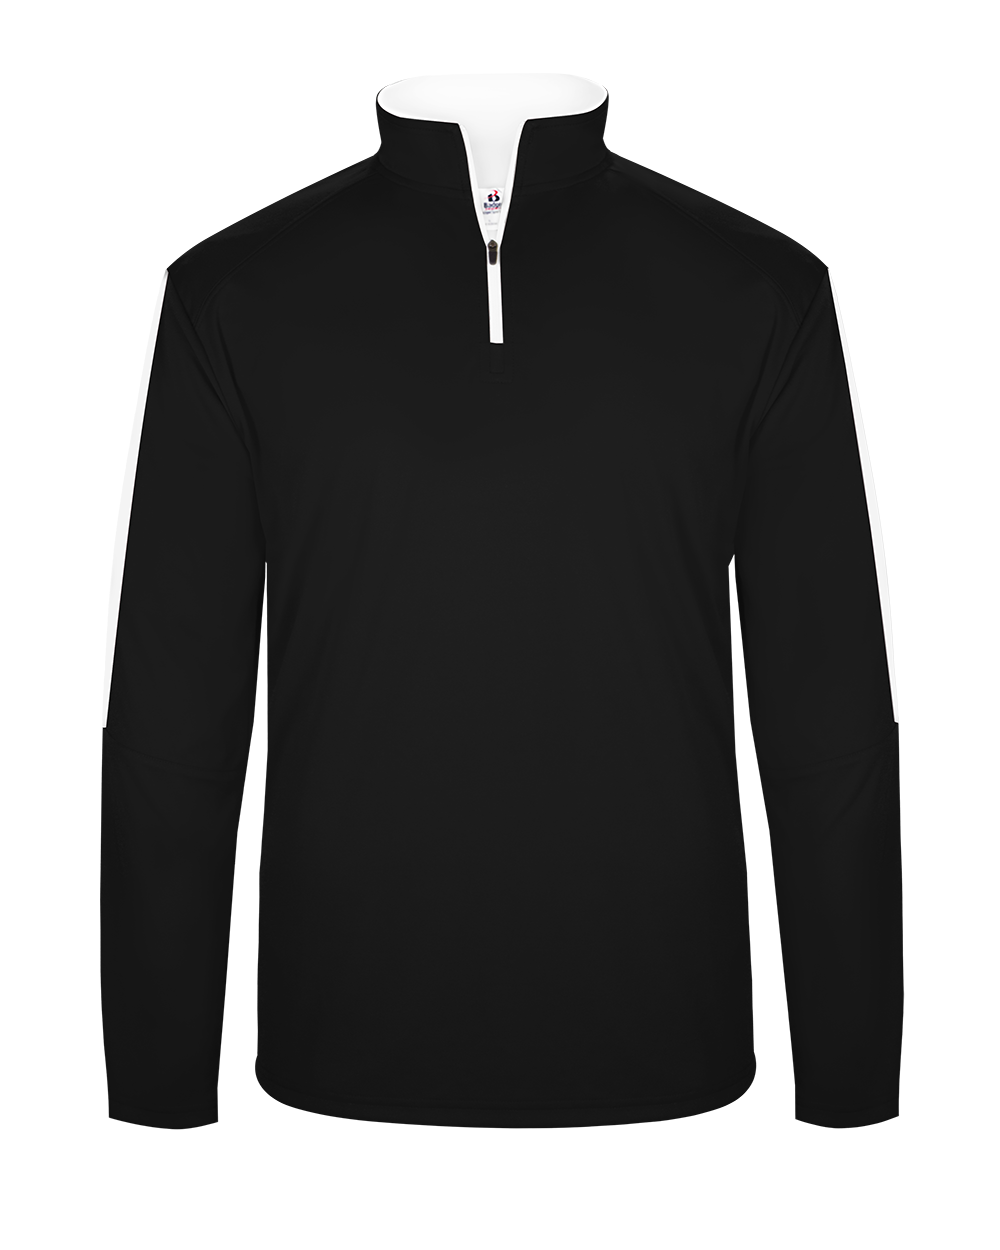 Sideline 1/4 Zip - Black/White